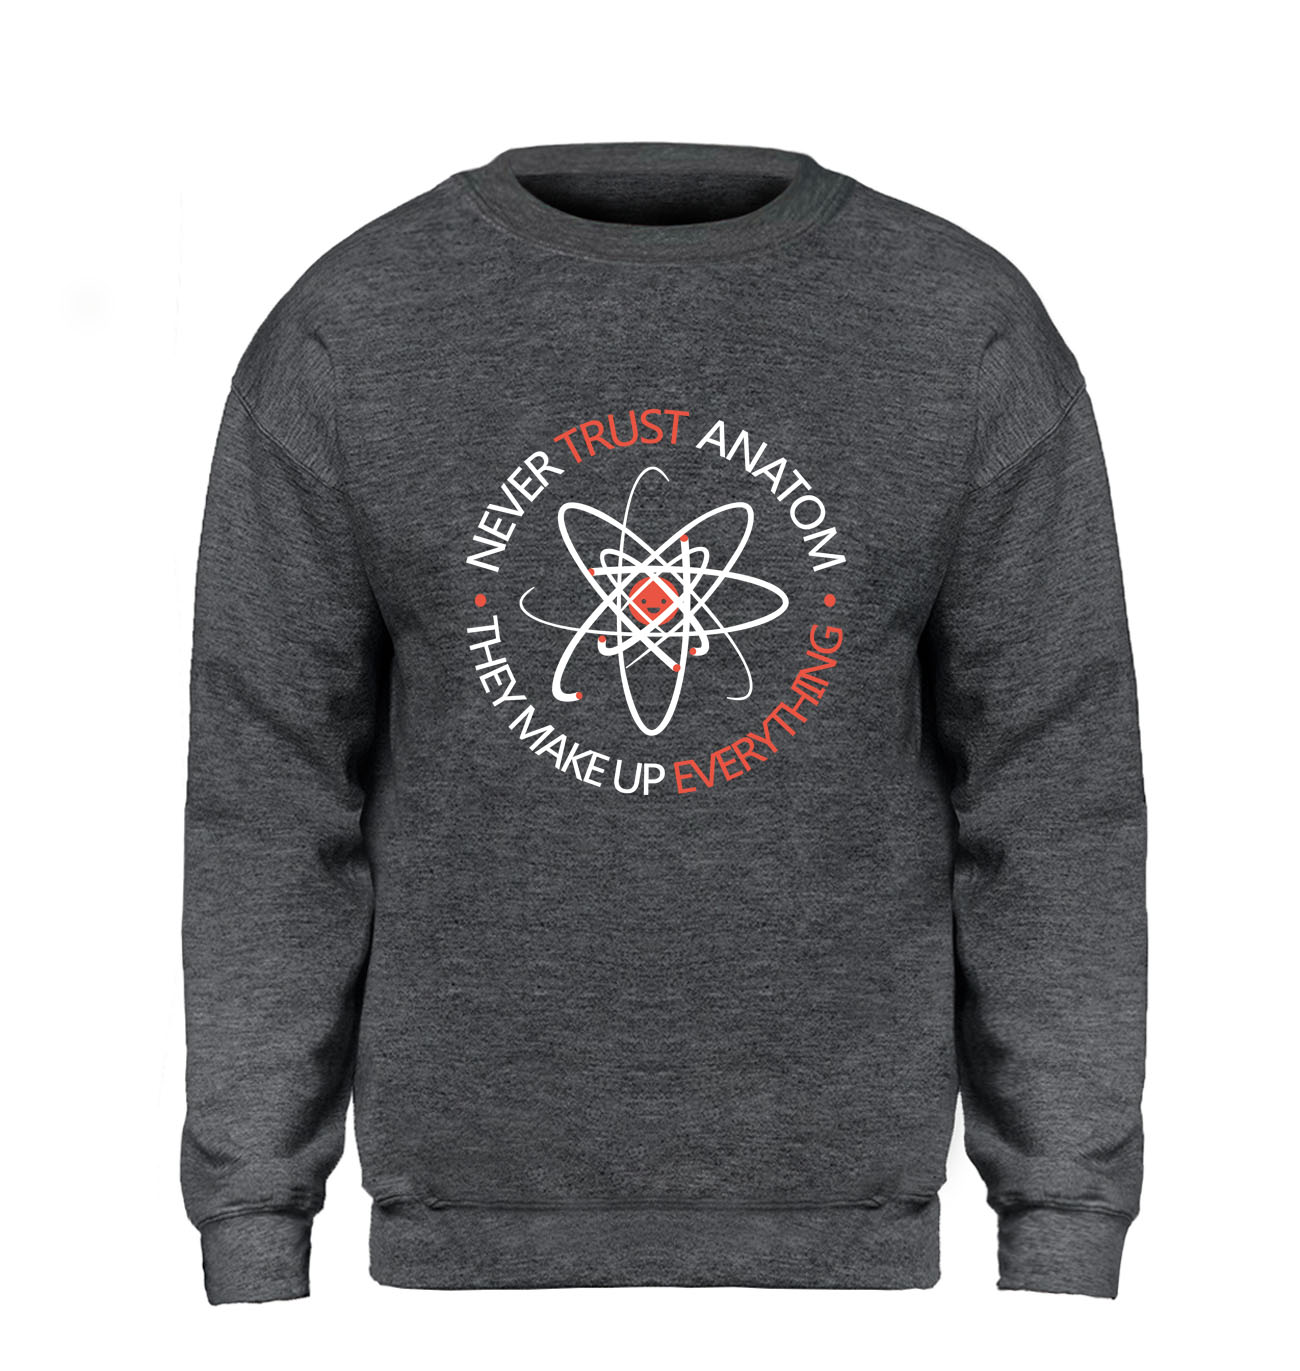 Never Trust an Atom, they Make Up Everything Hoodie Men Funny Science Unisex Sweatshirt Brand Winter Autumn Fleece Streetwear